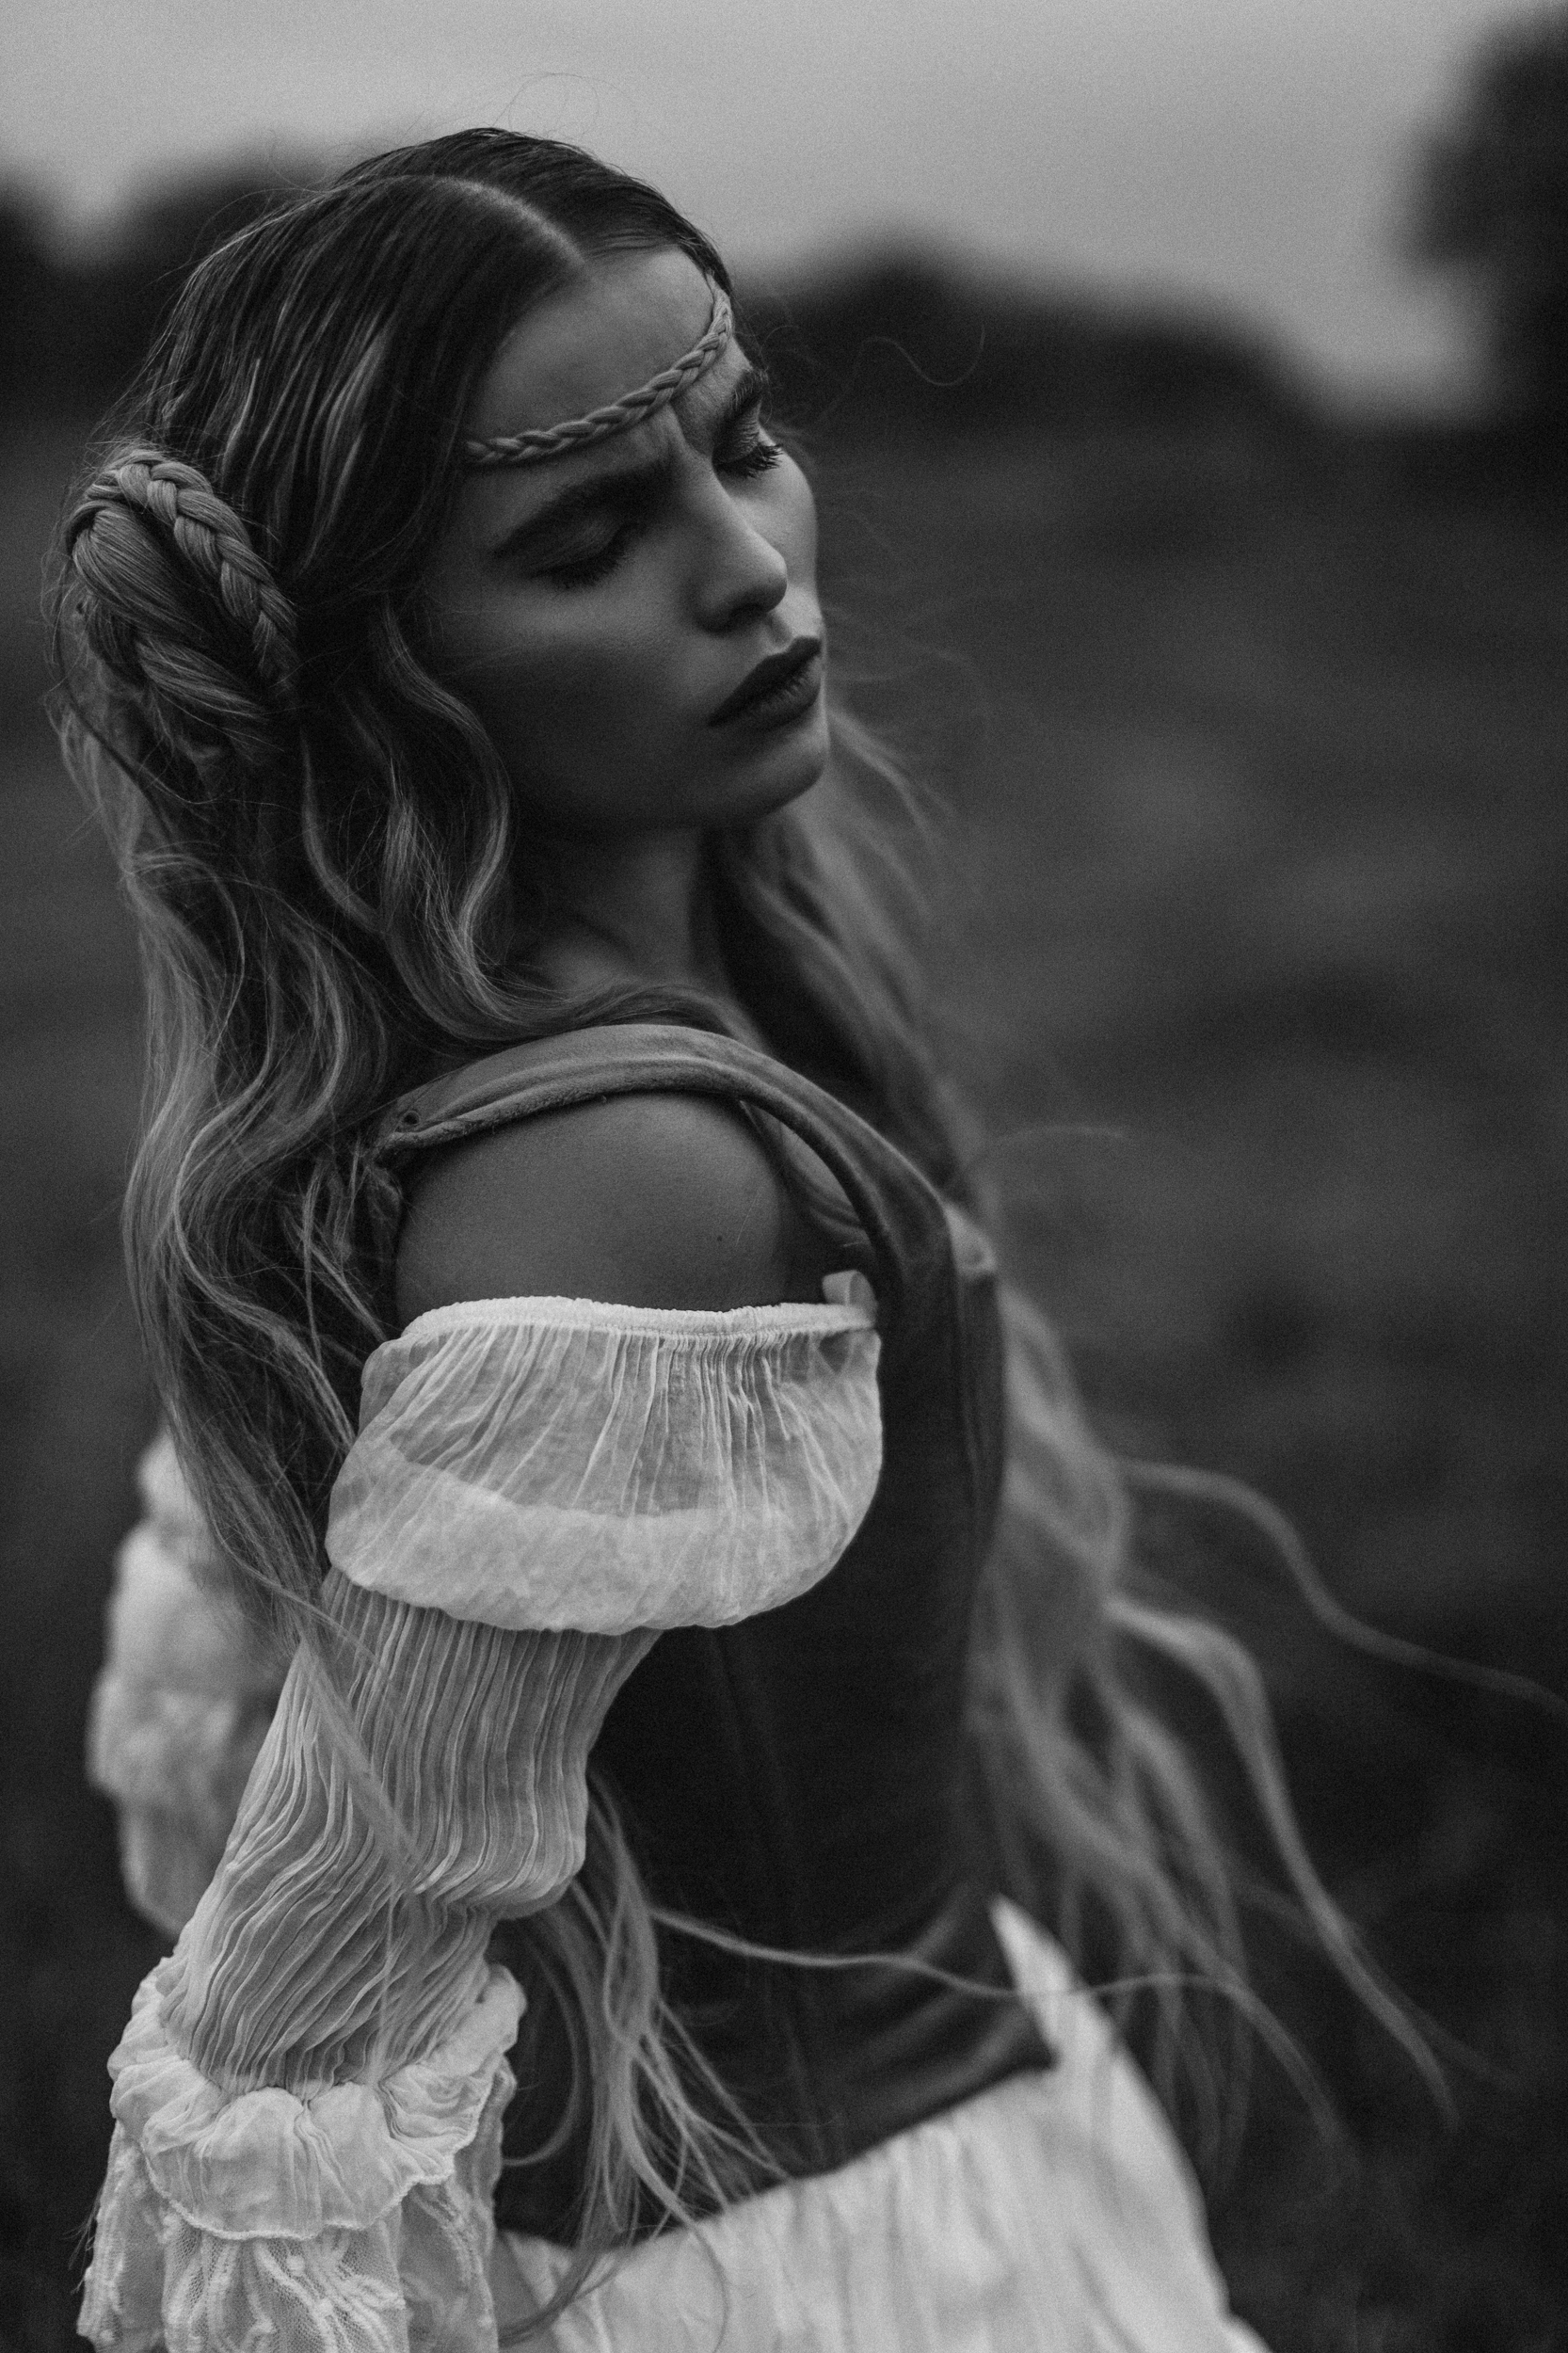 Осенняя прогулка / фотограф Мытник Валерия